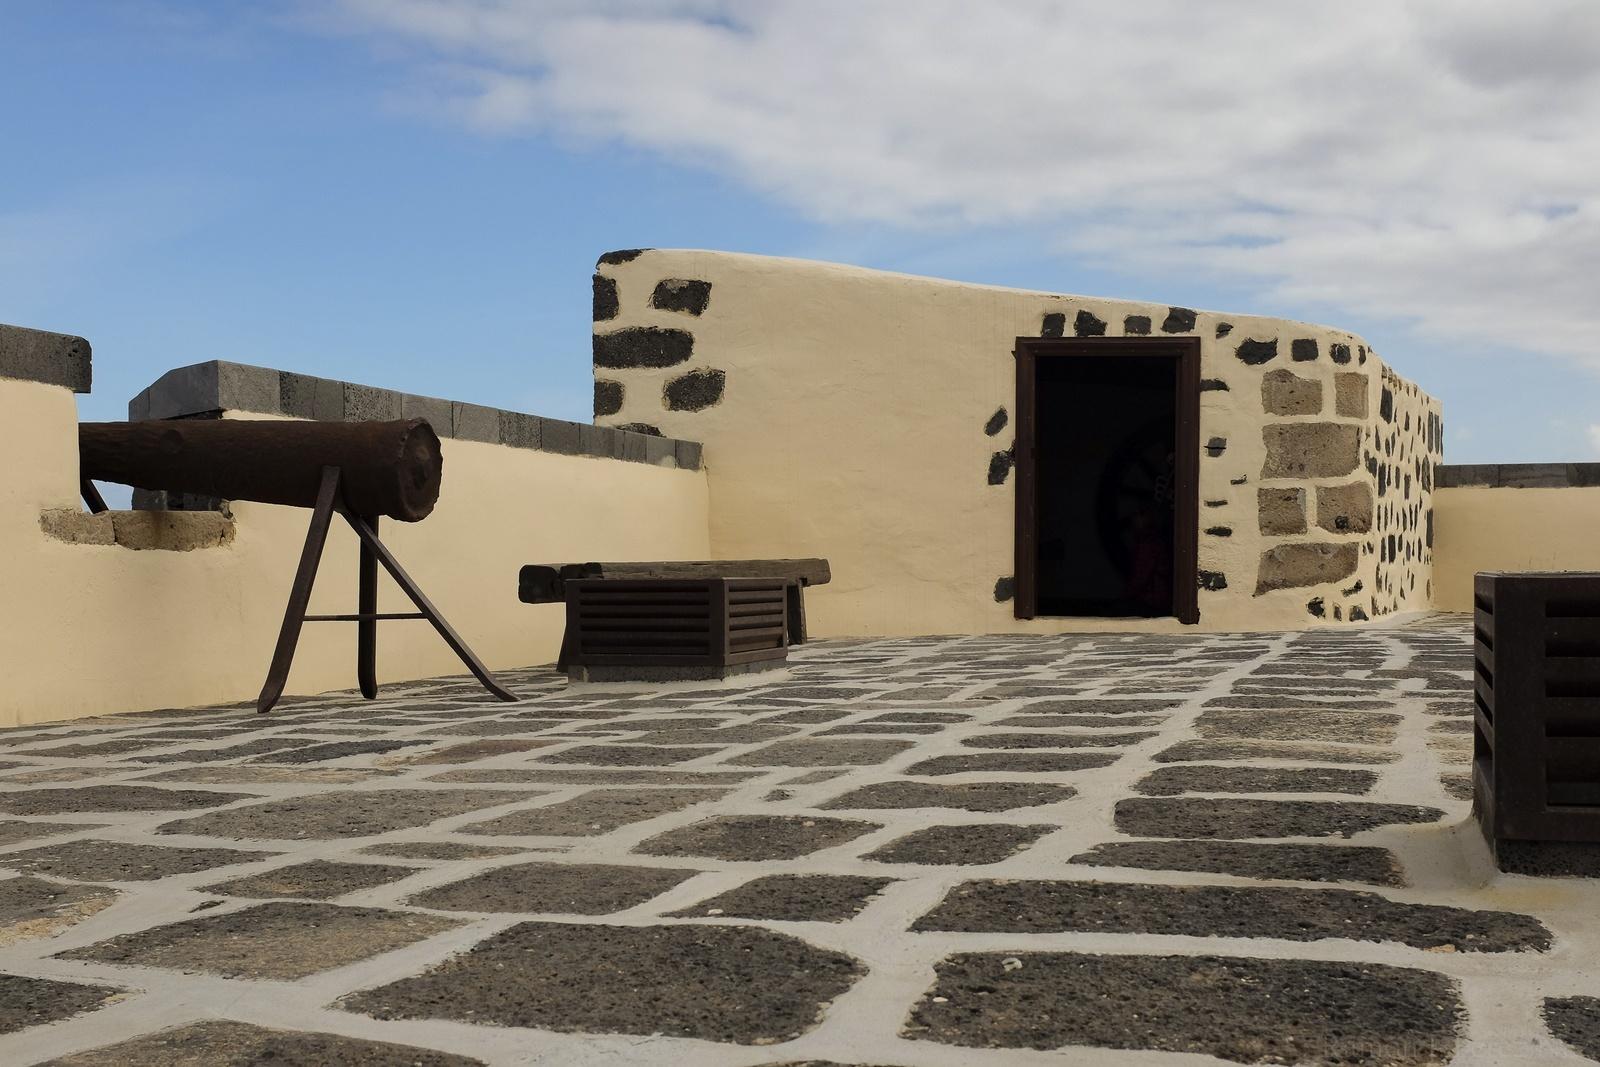 La plaza de armas o azotea del Castillo